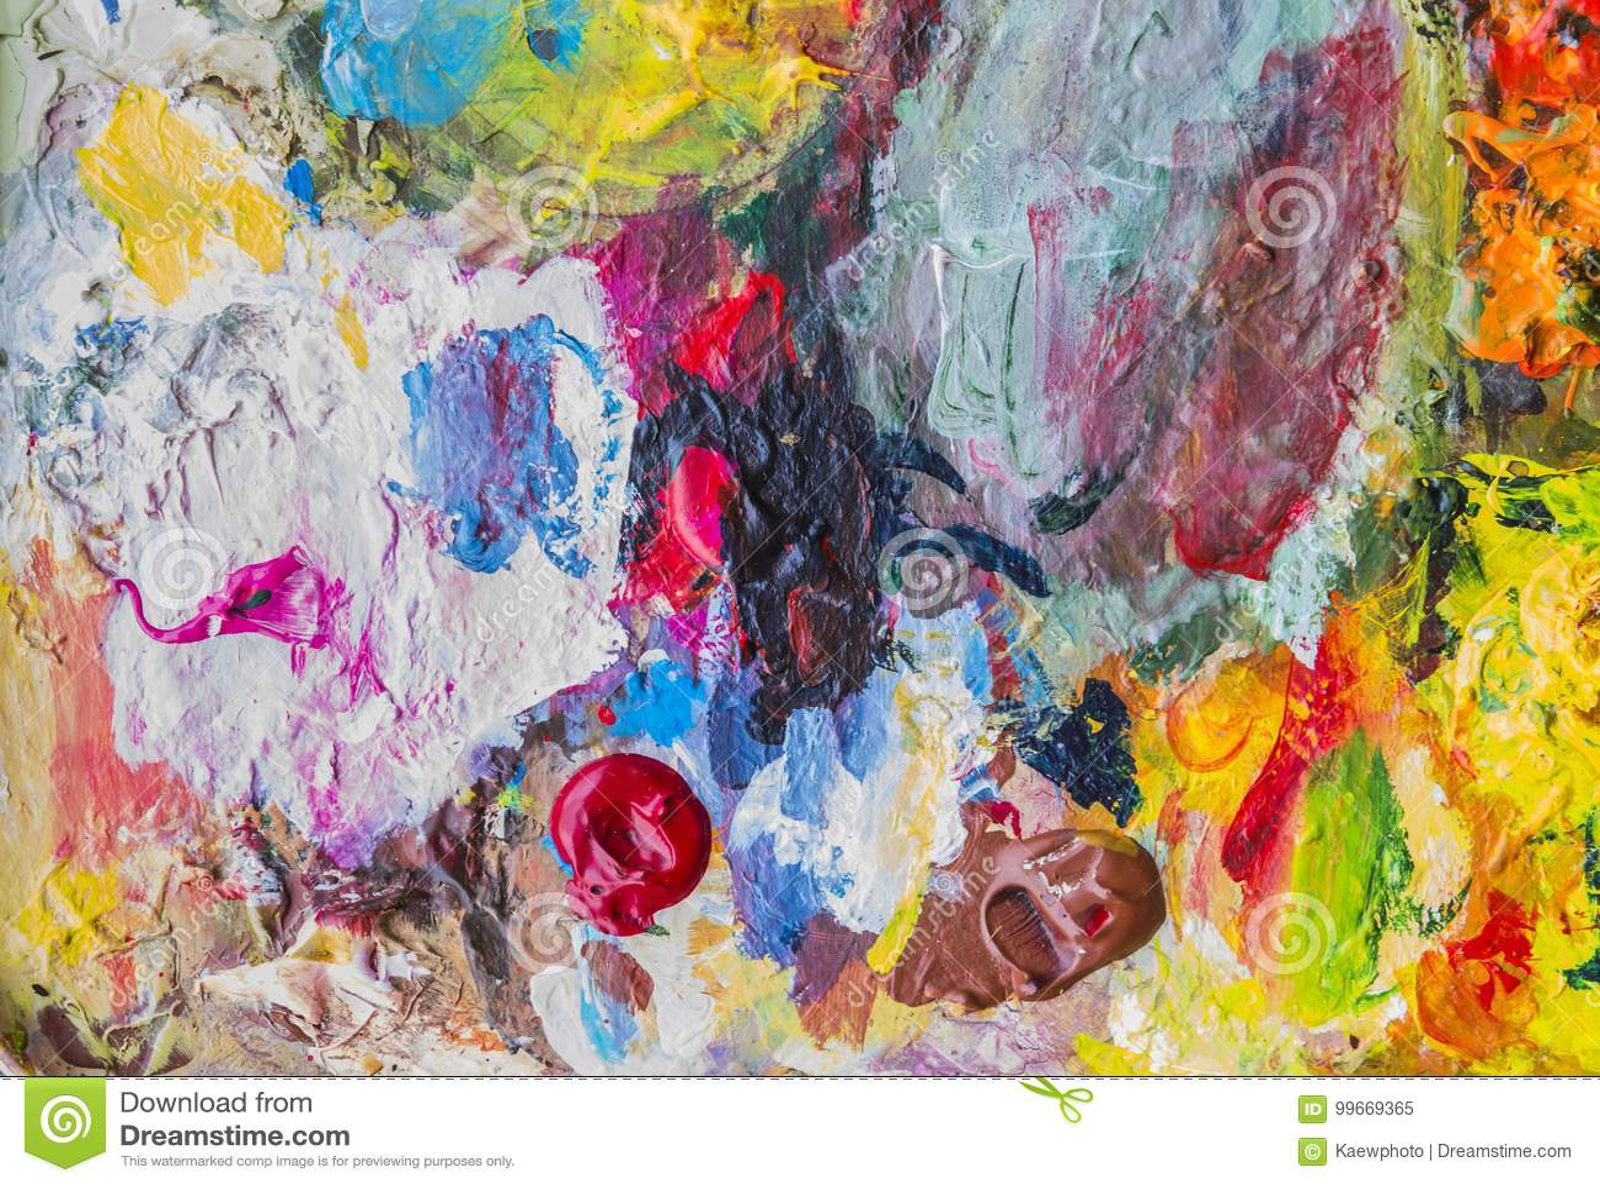 Paleta abstracta de la pintura acrílica de colorido, color de la mezcla, backgroun